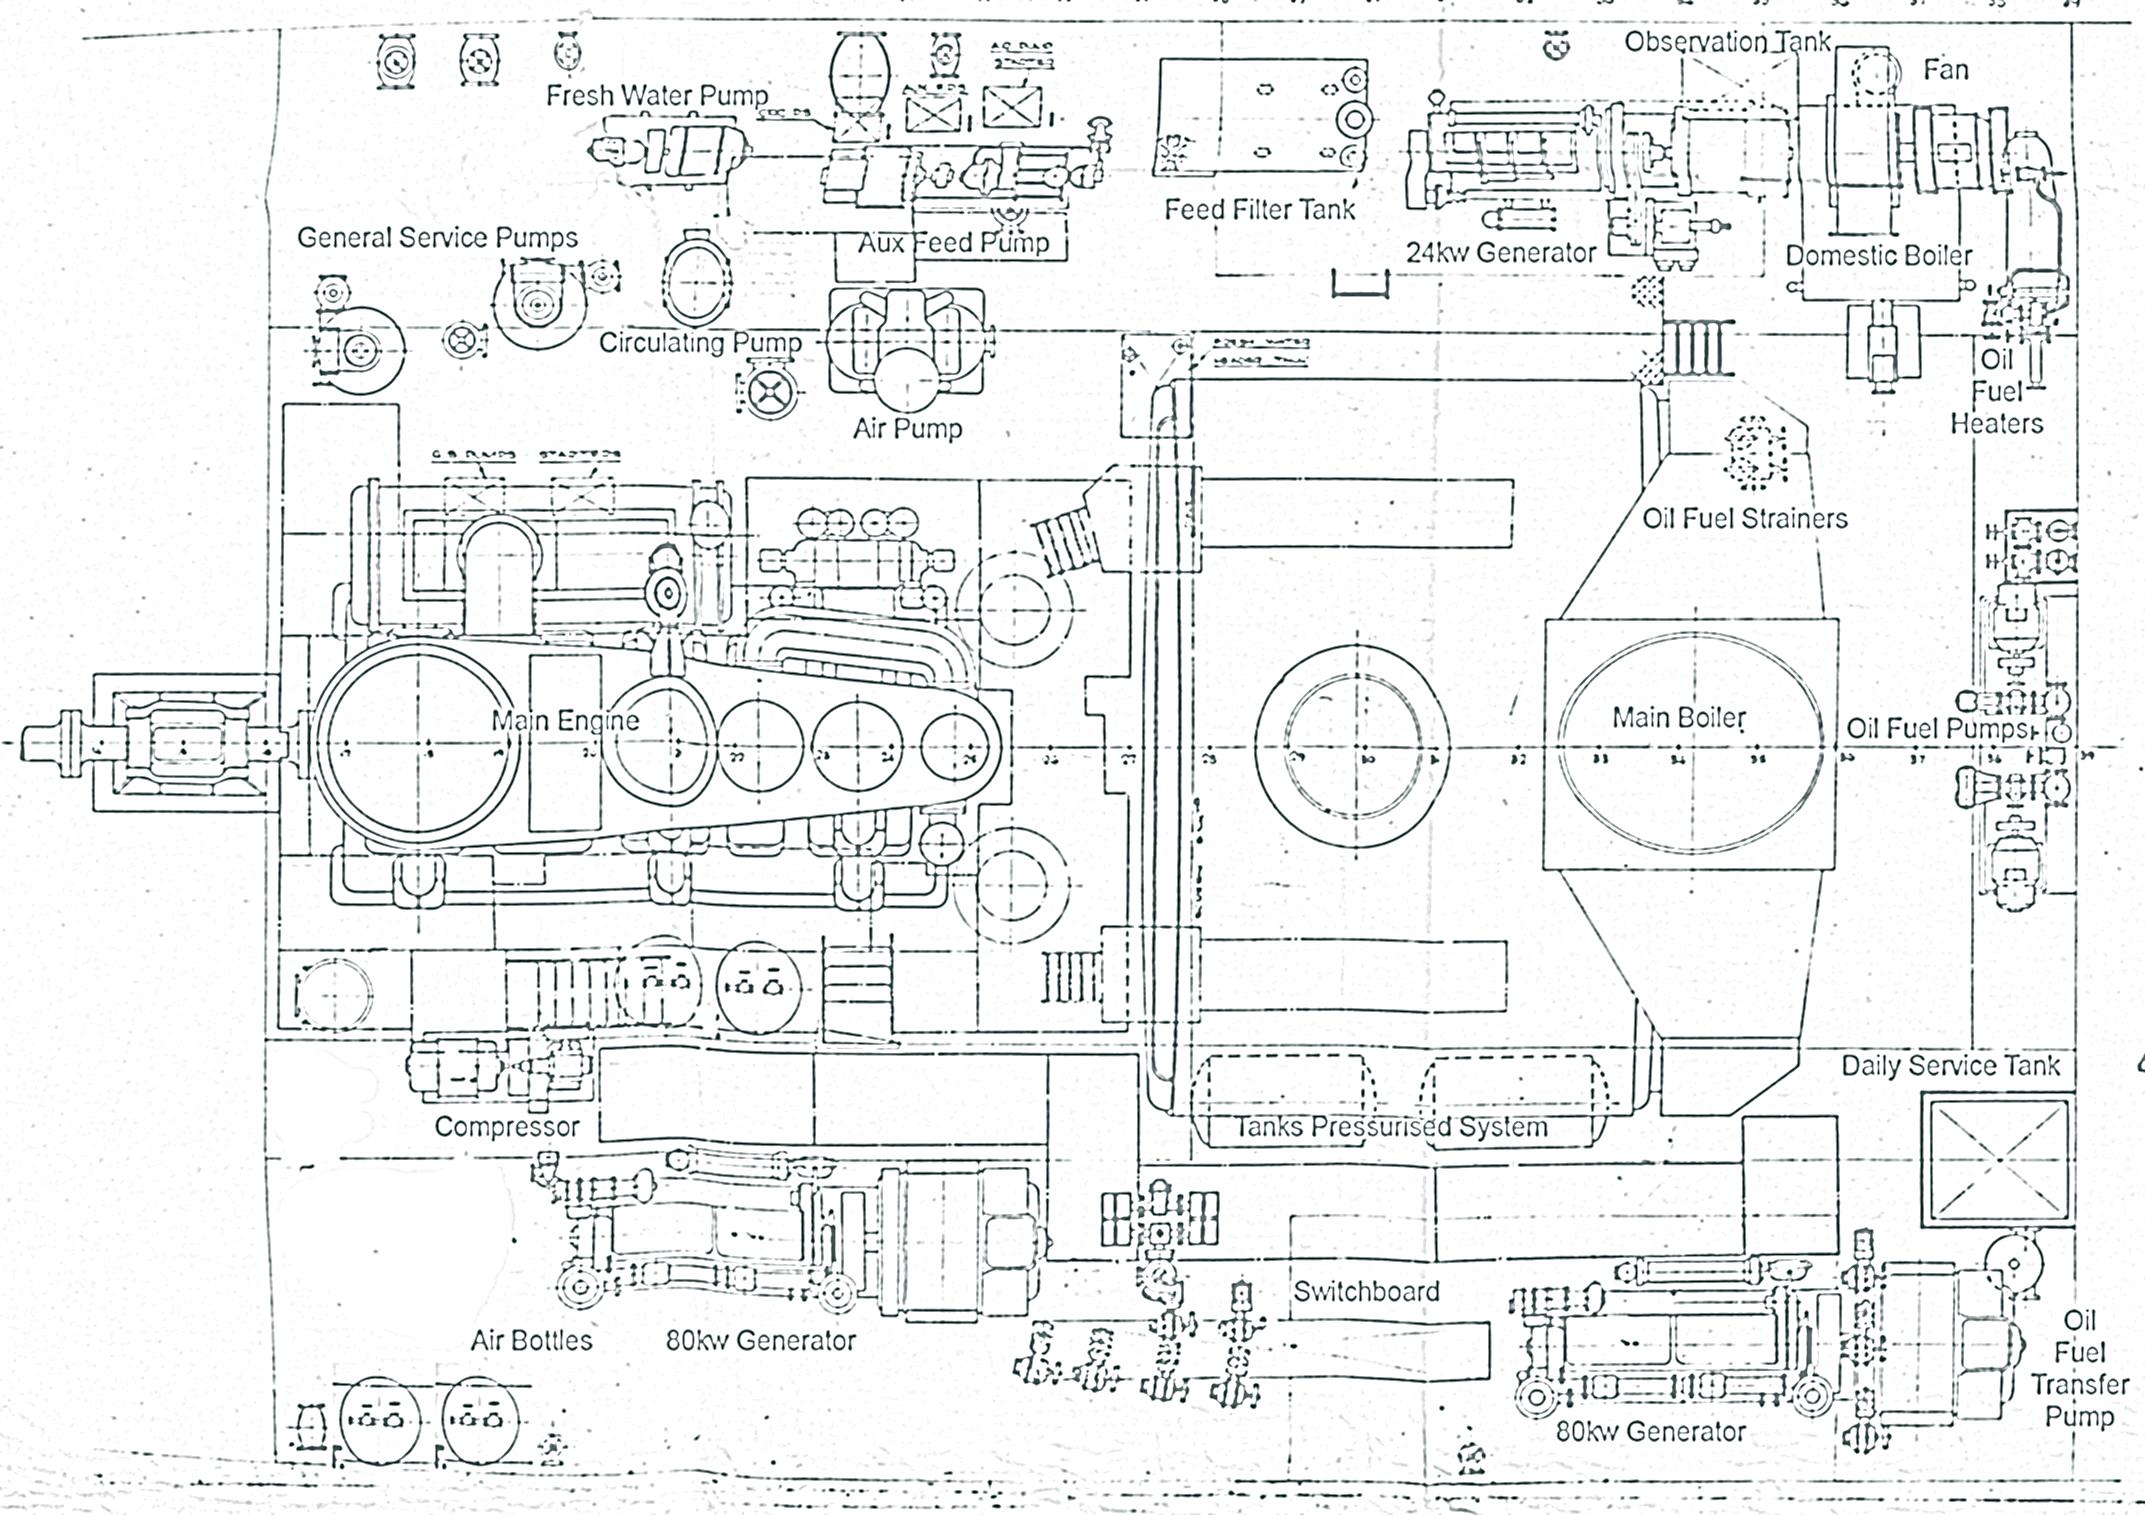 The Machinery - SS Explorer